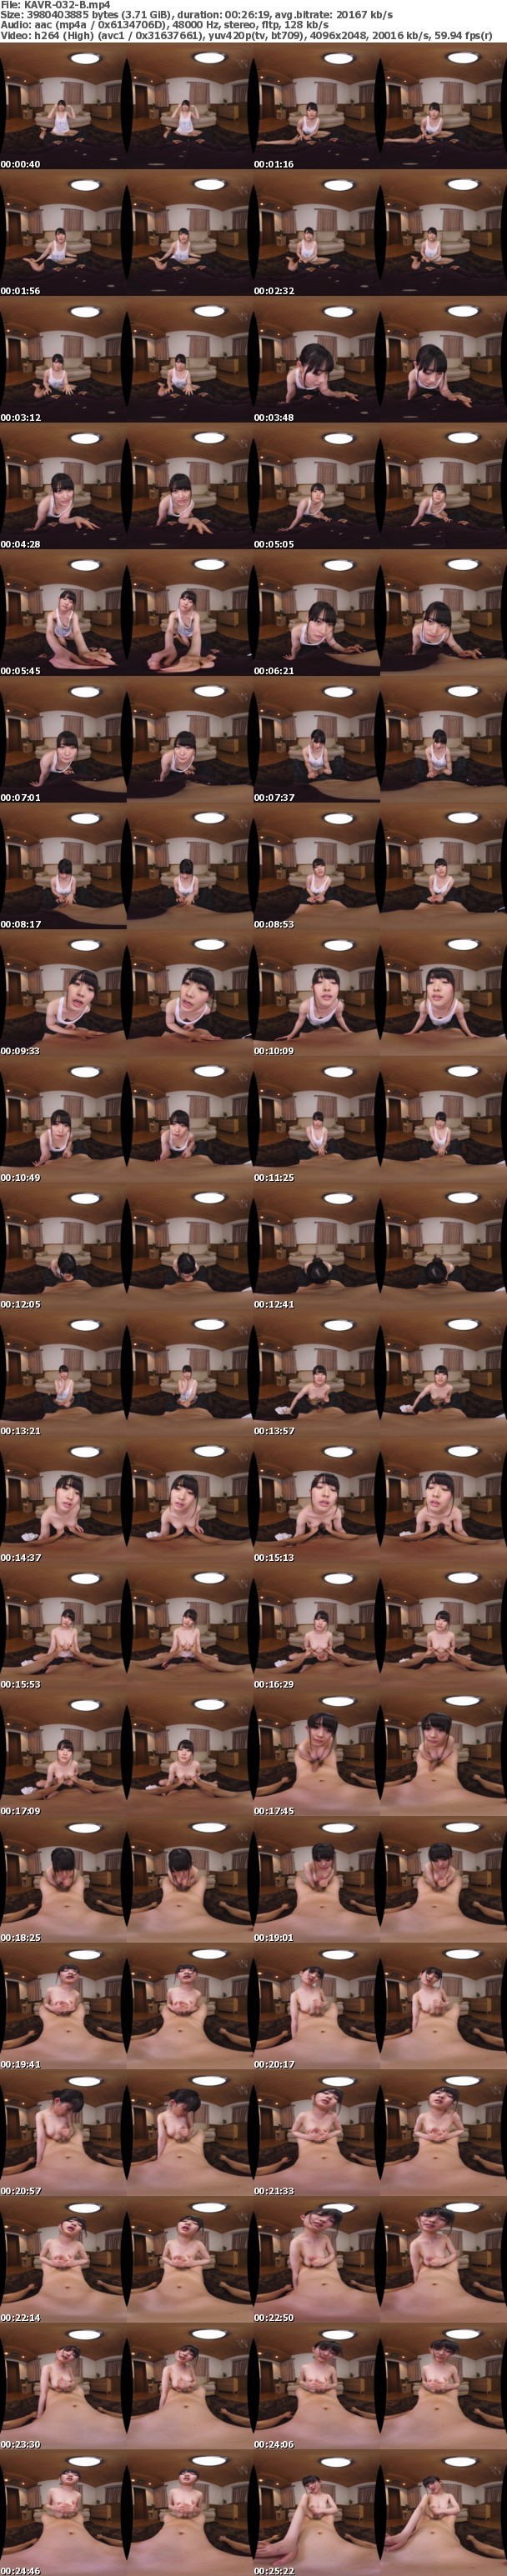 (VR) KAVR-032 お兄ちゃん連呼!仮想兄妹体験VR 妹に甘え声で超密着されて… 誘惑に負けちゃったボク 友利ほのか